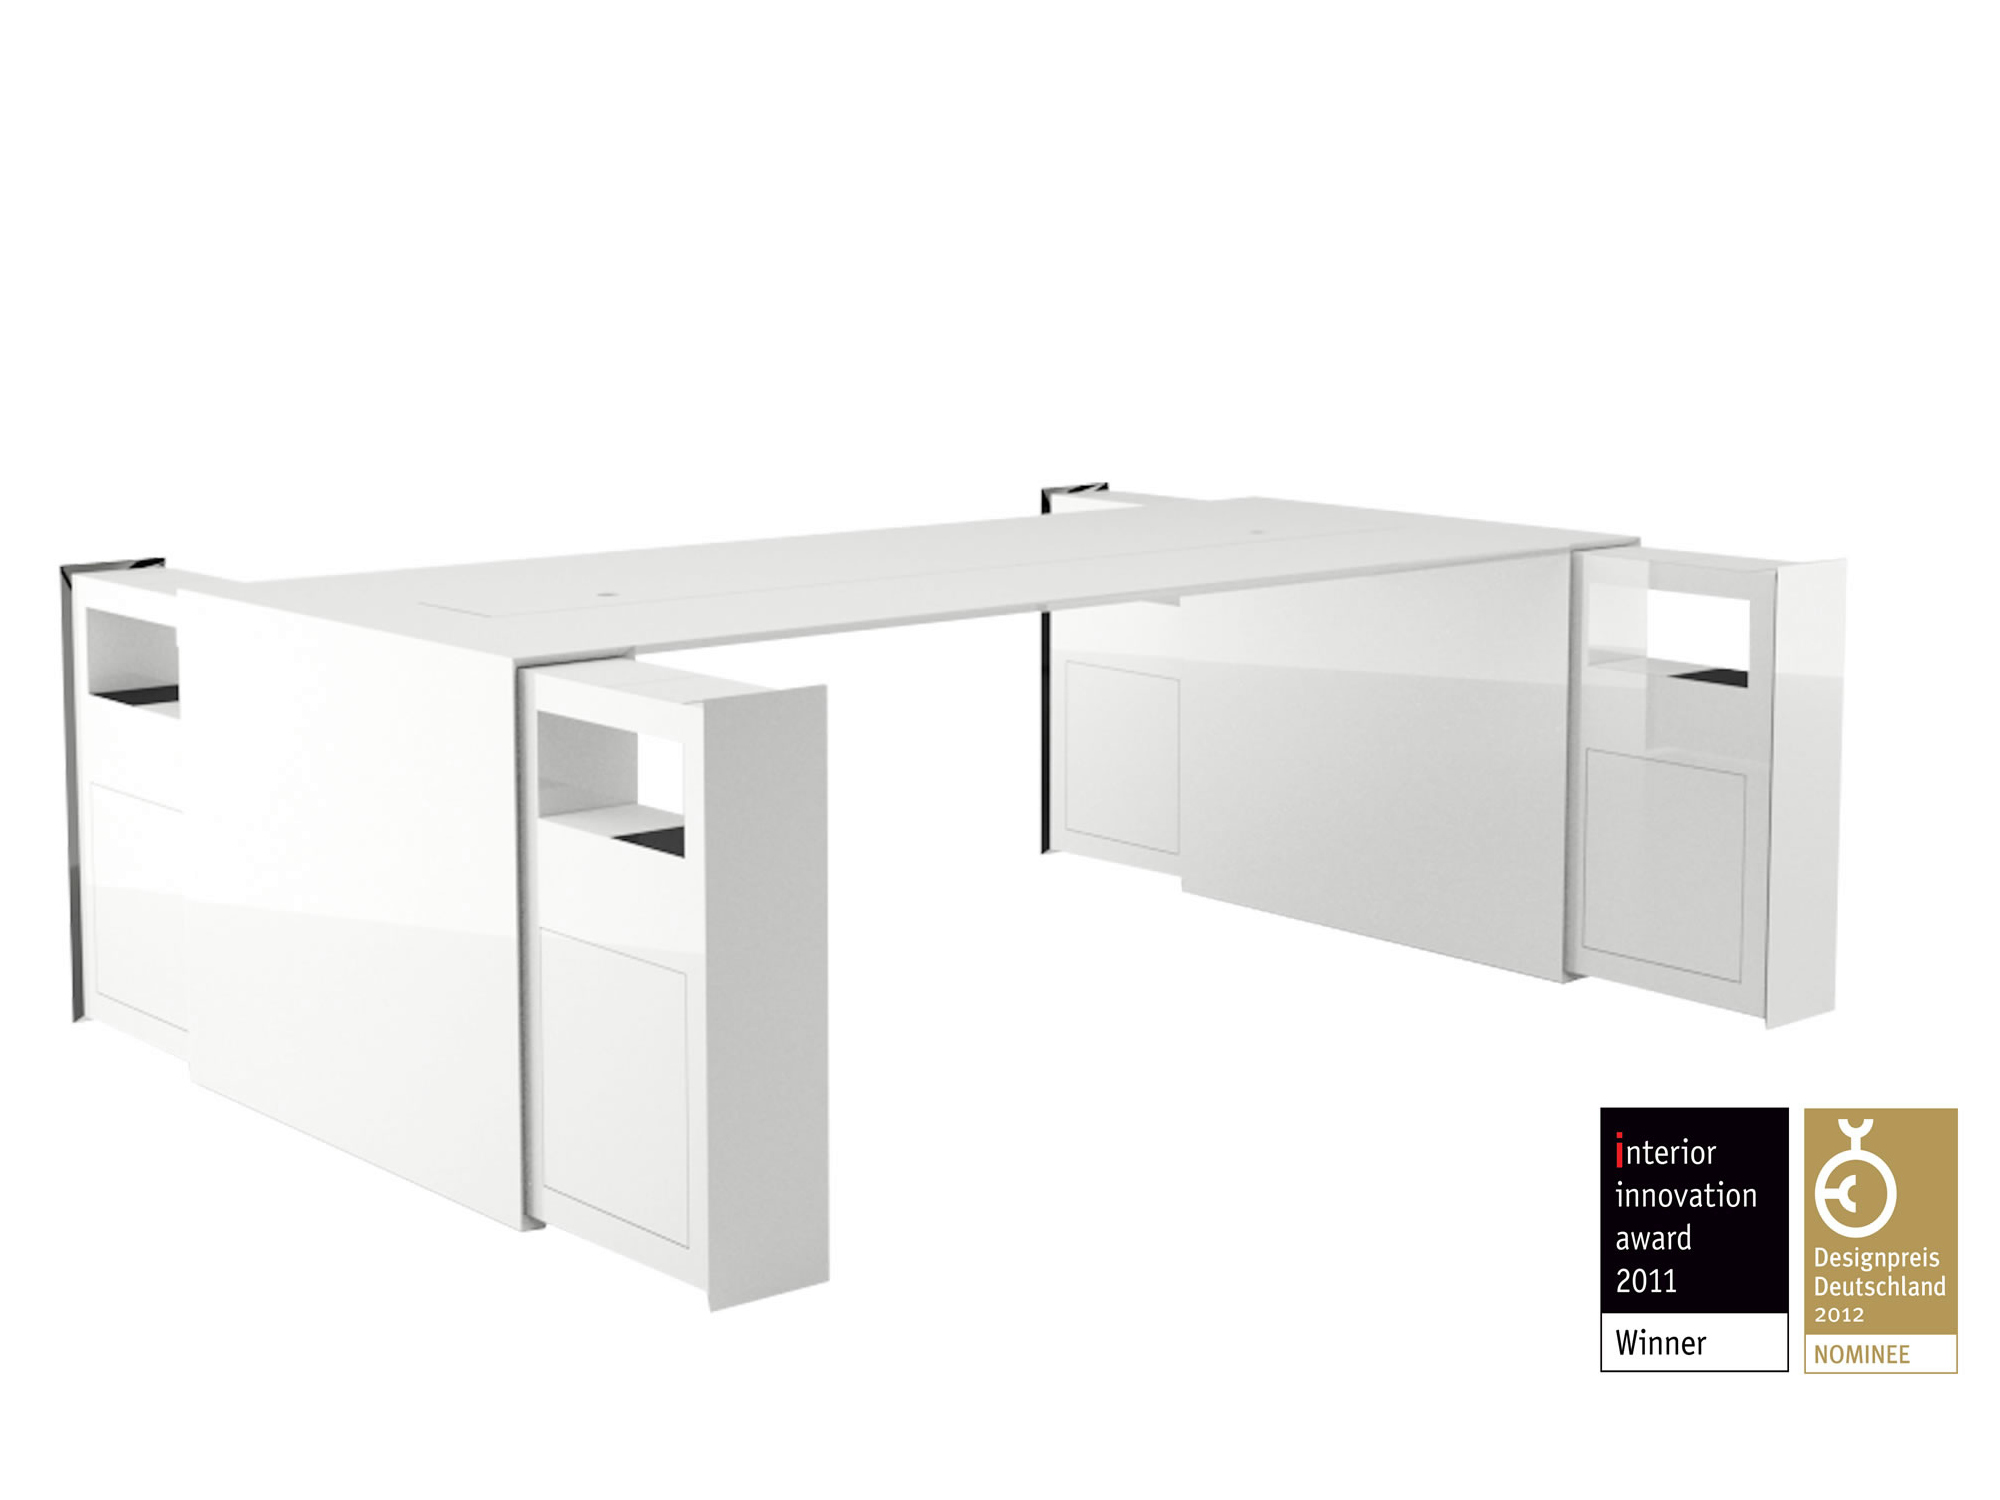 mechanismus in autos juli 2015. Black Bedroom Furniture Sets. Home Design Ideas